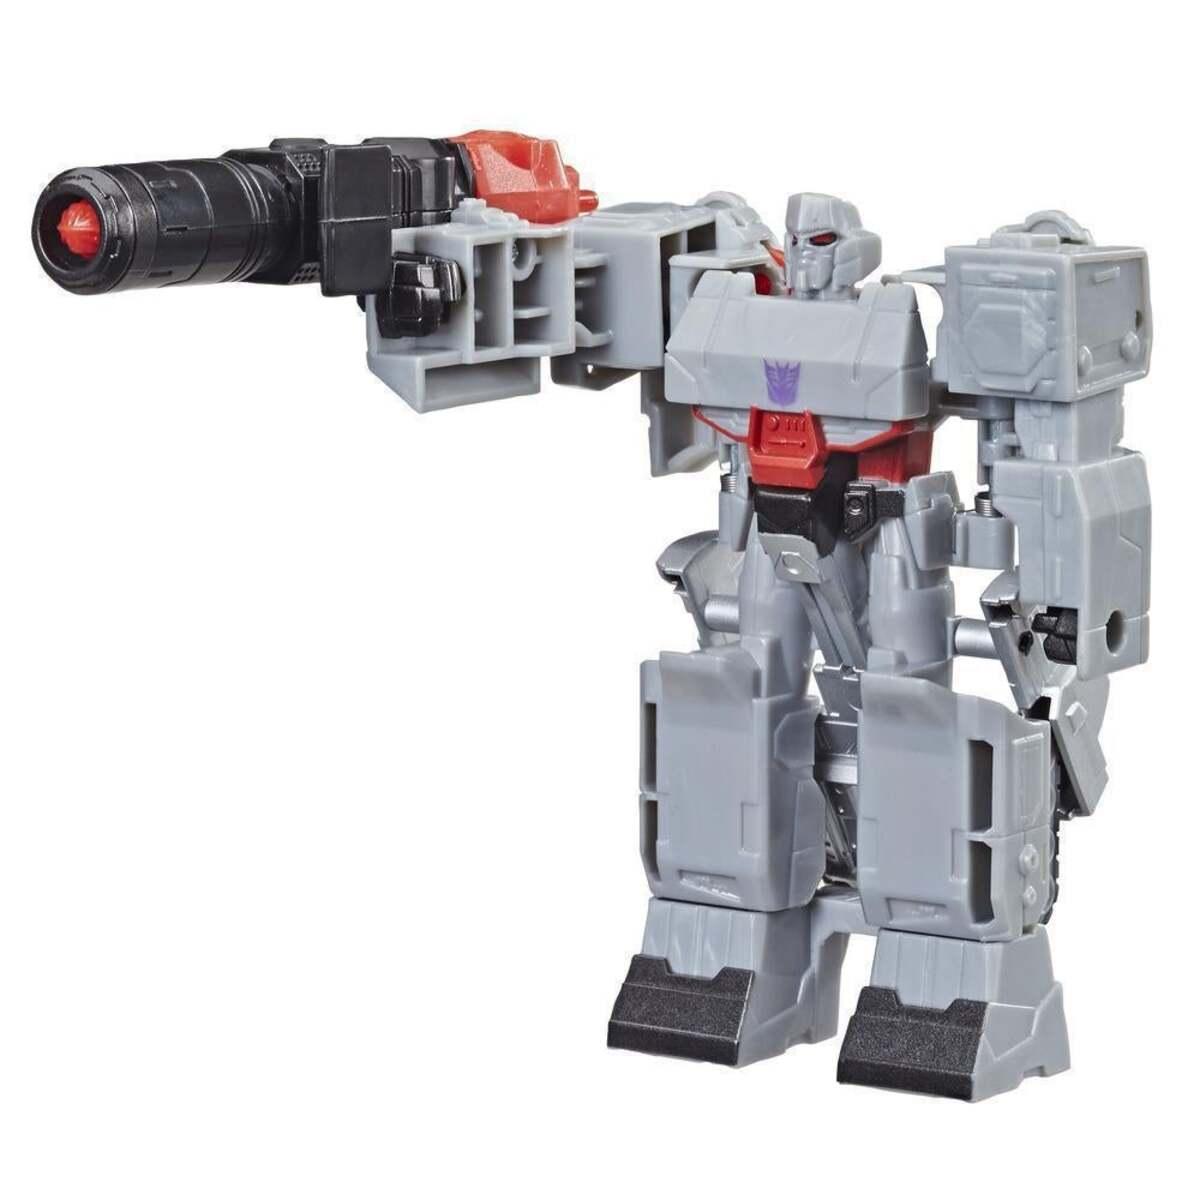 Bild 5 von Hasbro Transformers Cyberverse Action Attackers: 1-Step